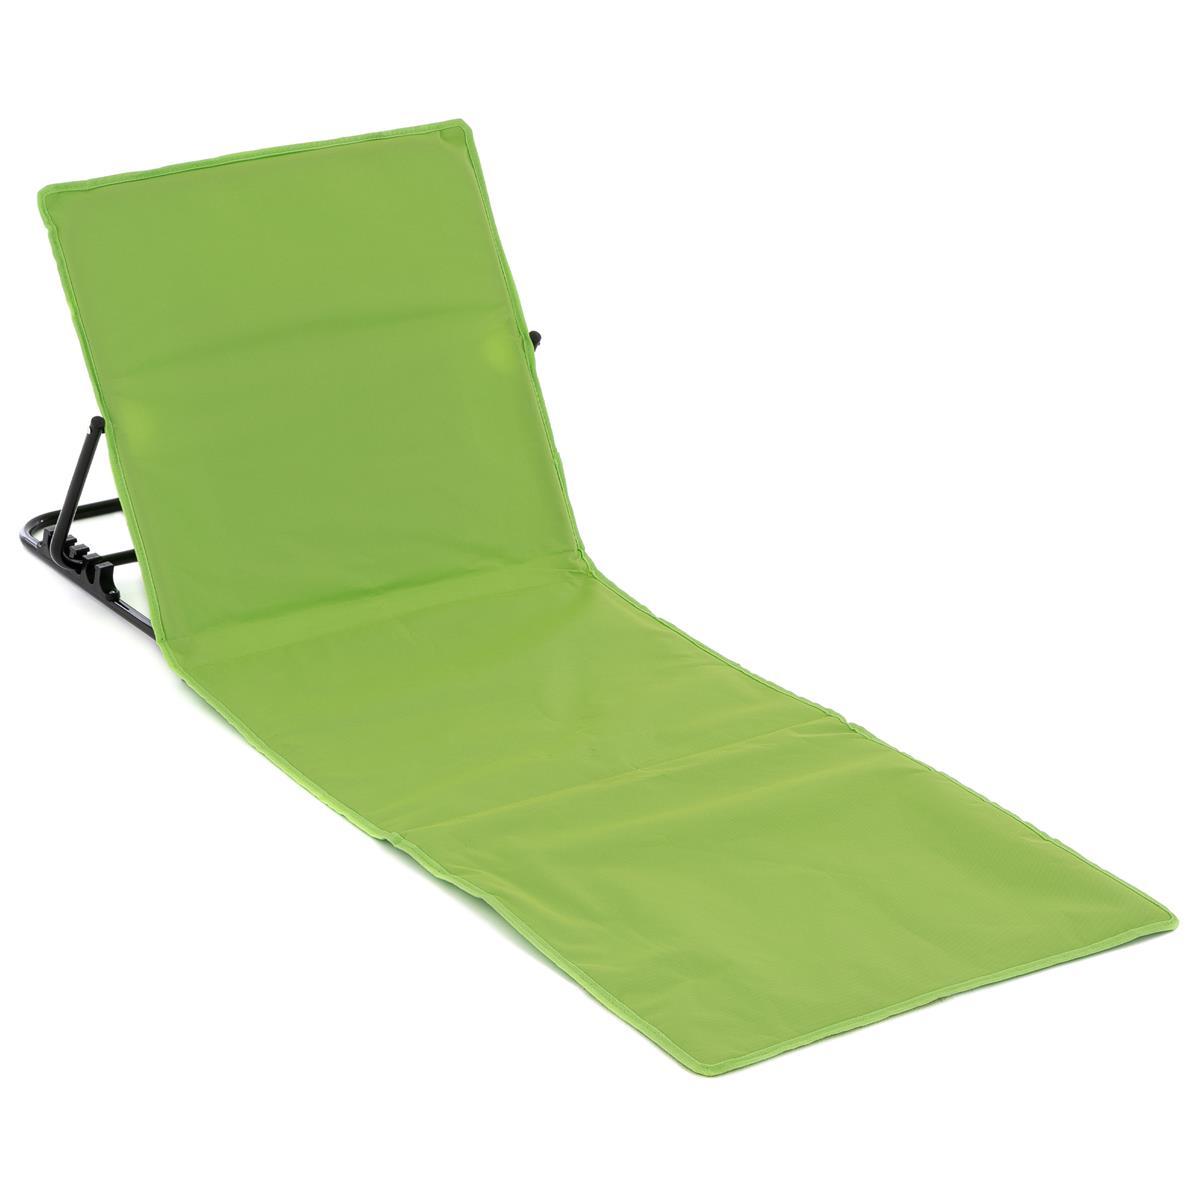 Strandmatte Beachmatte gepolstert faltbar verstellbare Rückenlehne grün